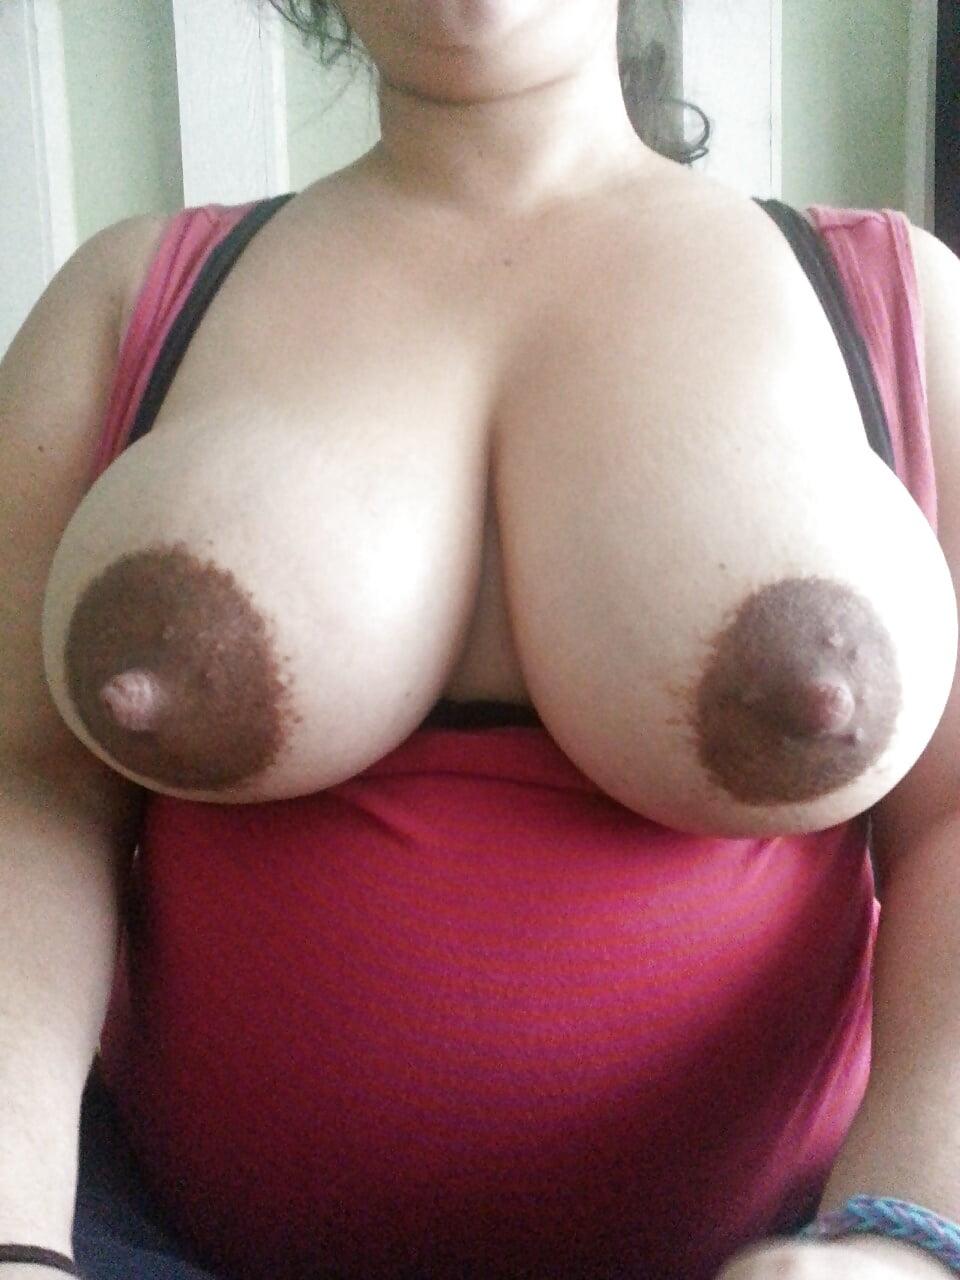 Big brown boobs, afgan sexy nude girls